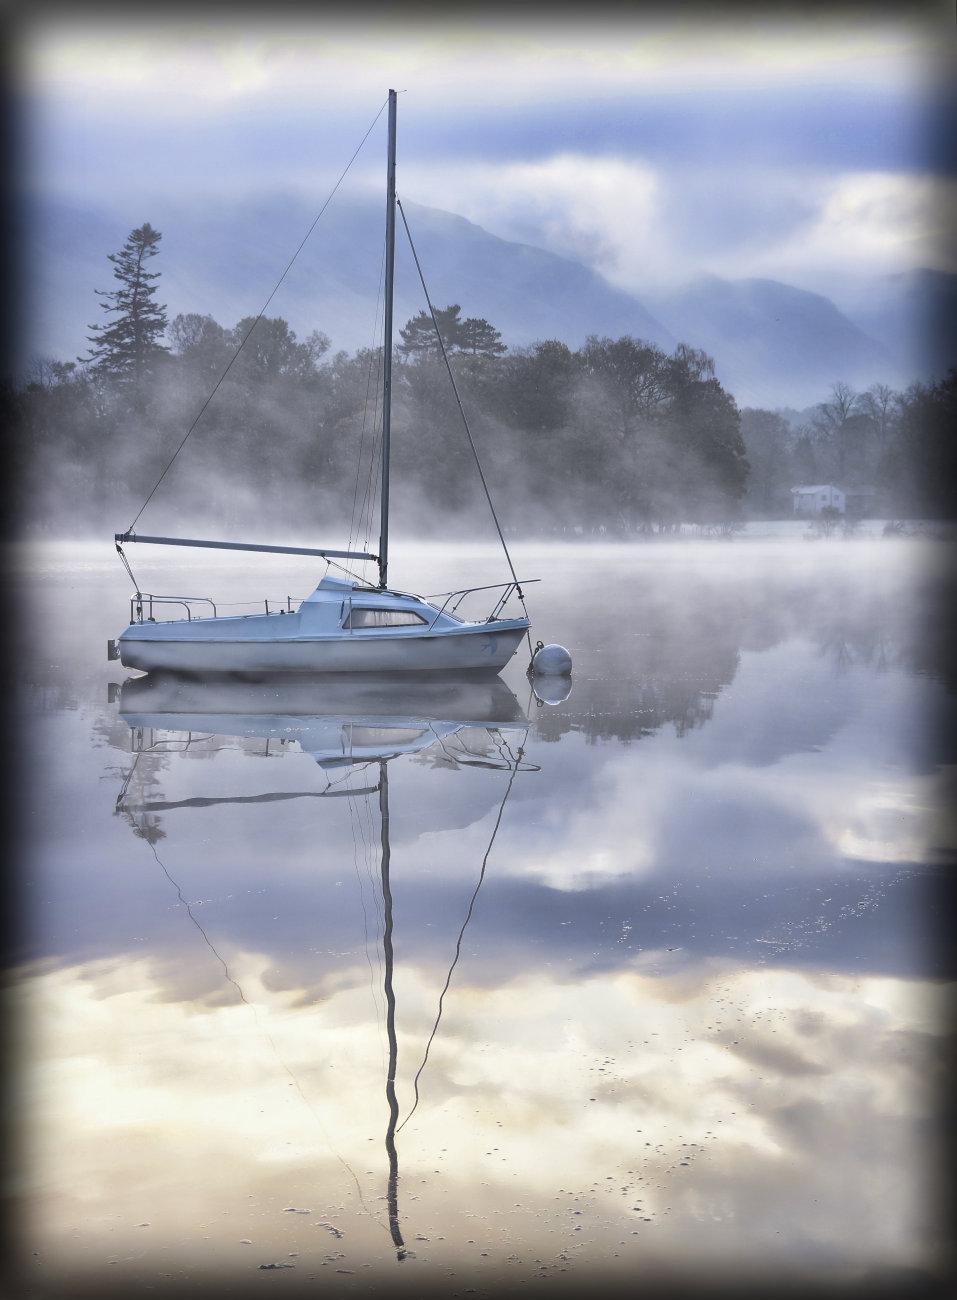 Morning mist on Ullswater